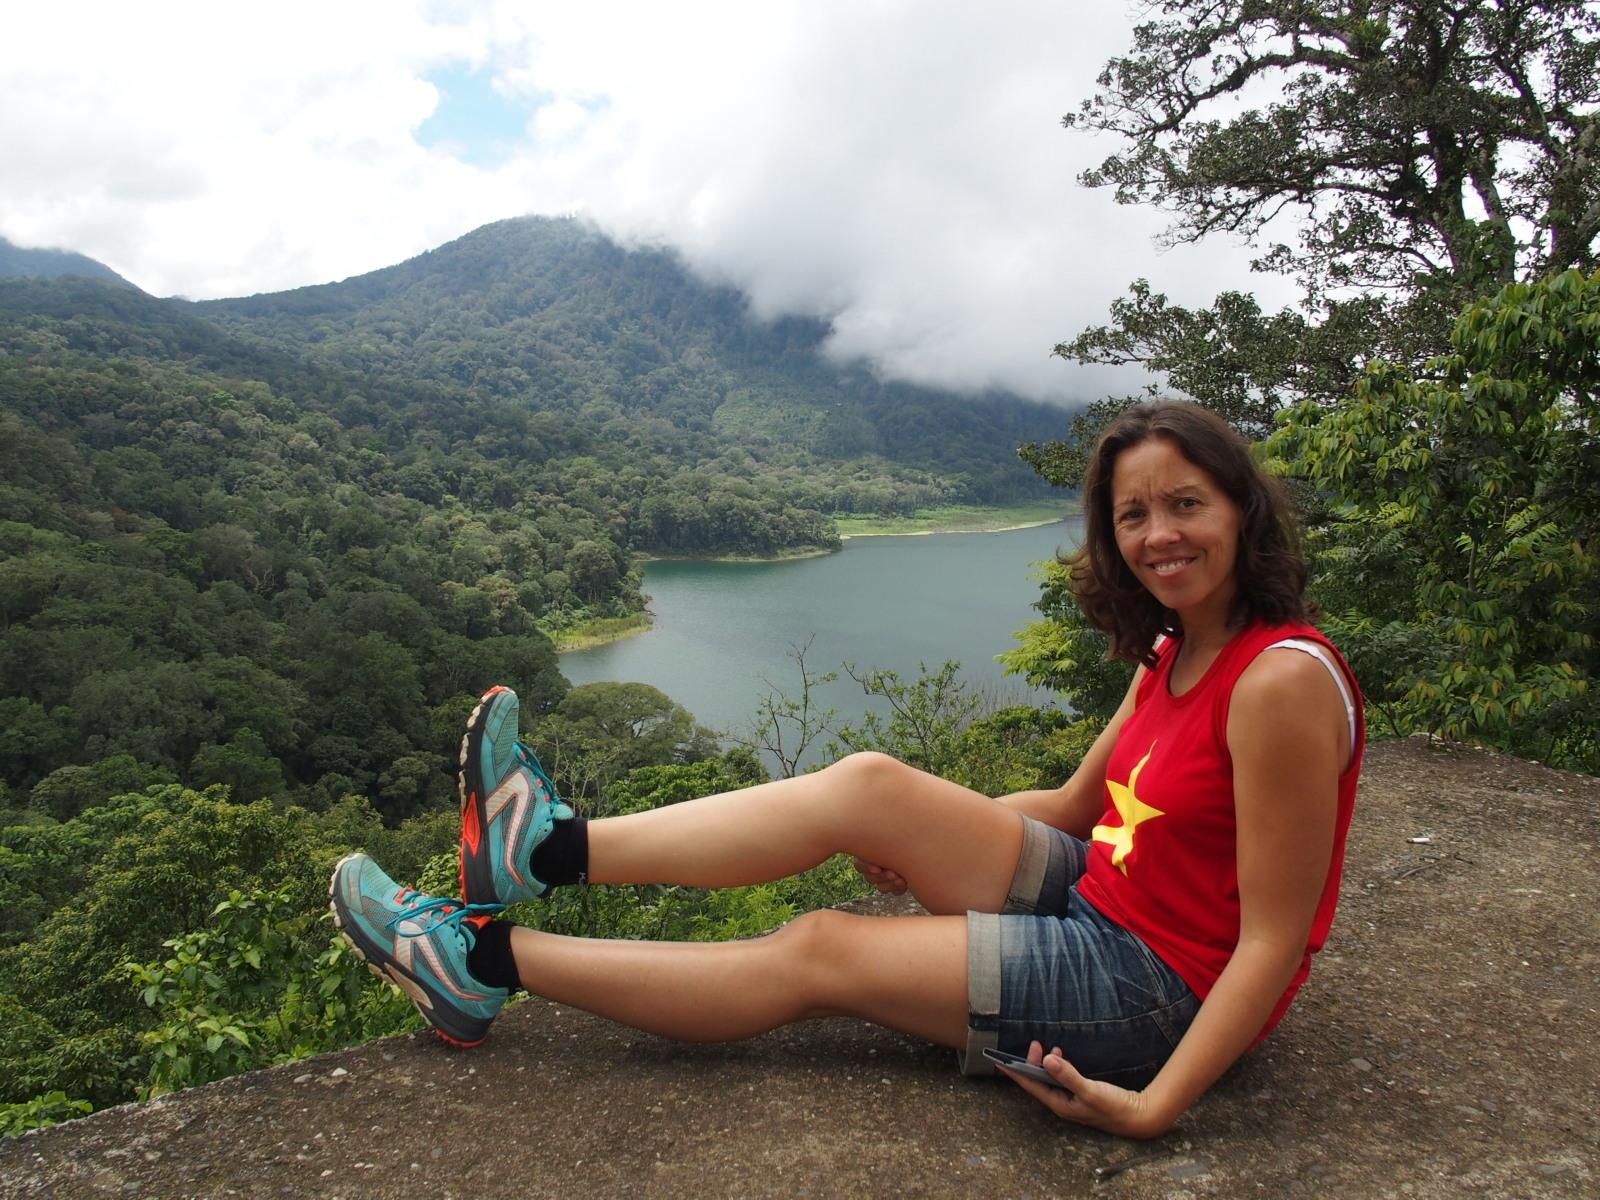 Guinou et ses Kalenji Kapteren Crossover aux lacs Tambligan et Buyan - Bali